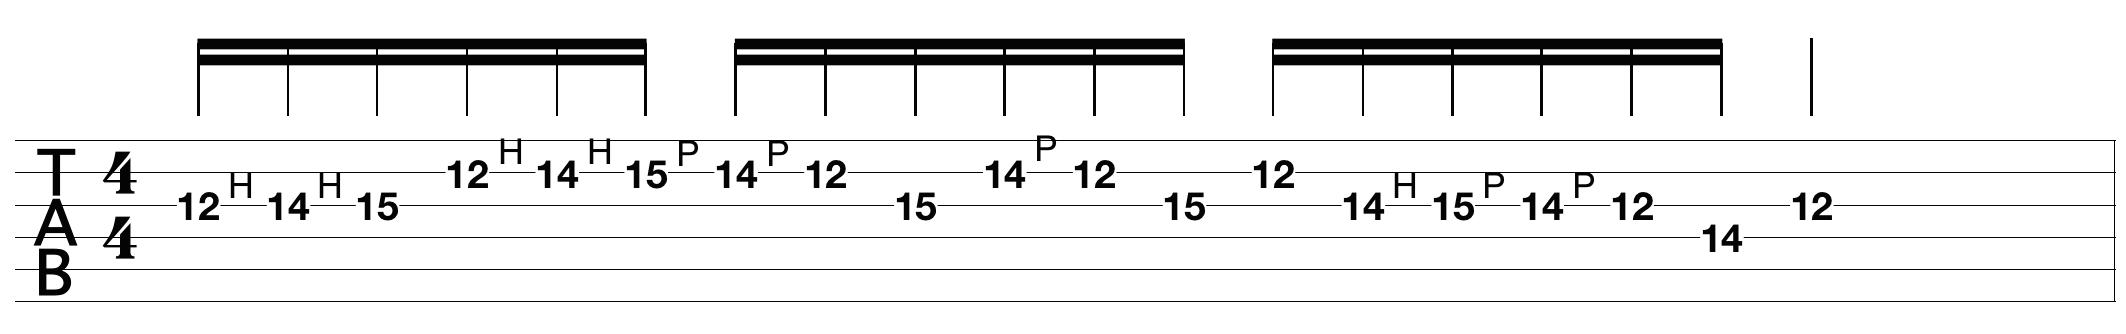 electric-guitar-licks_1.png